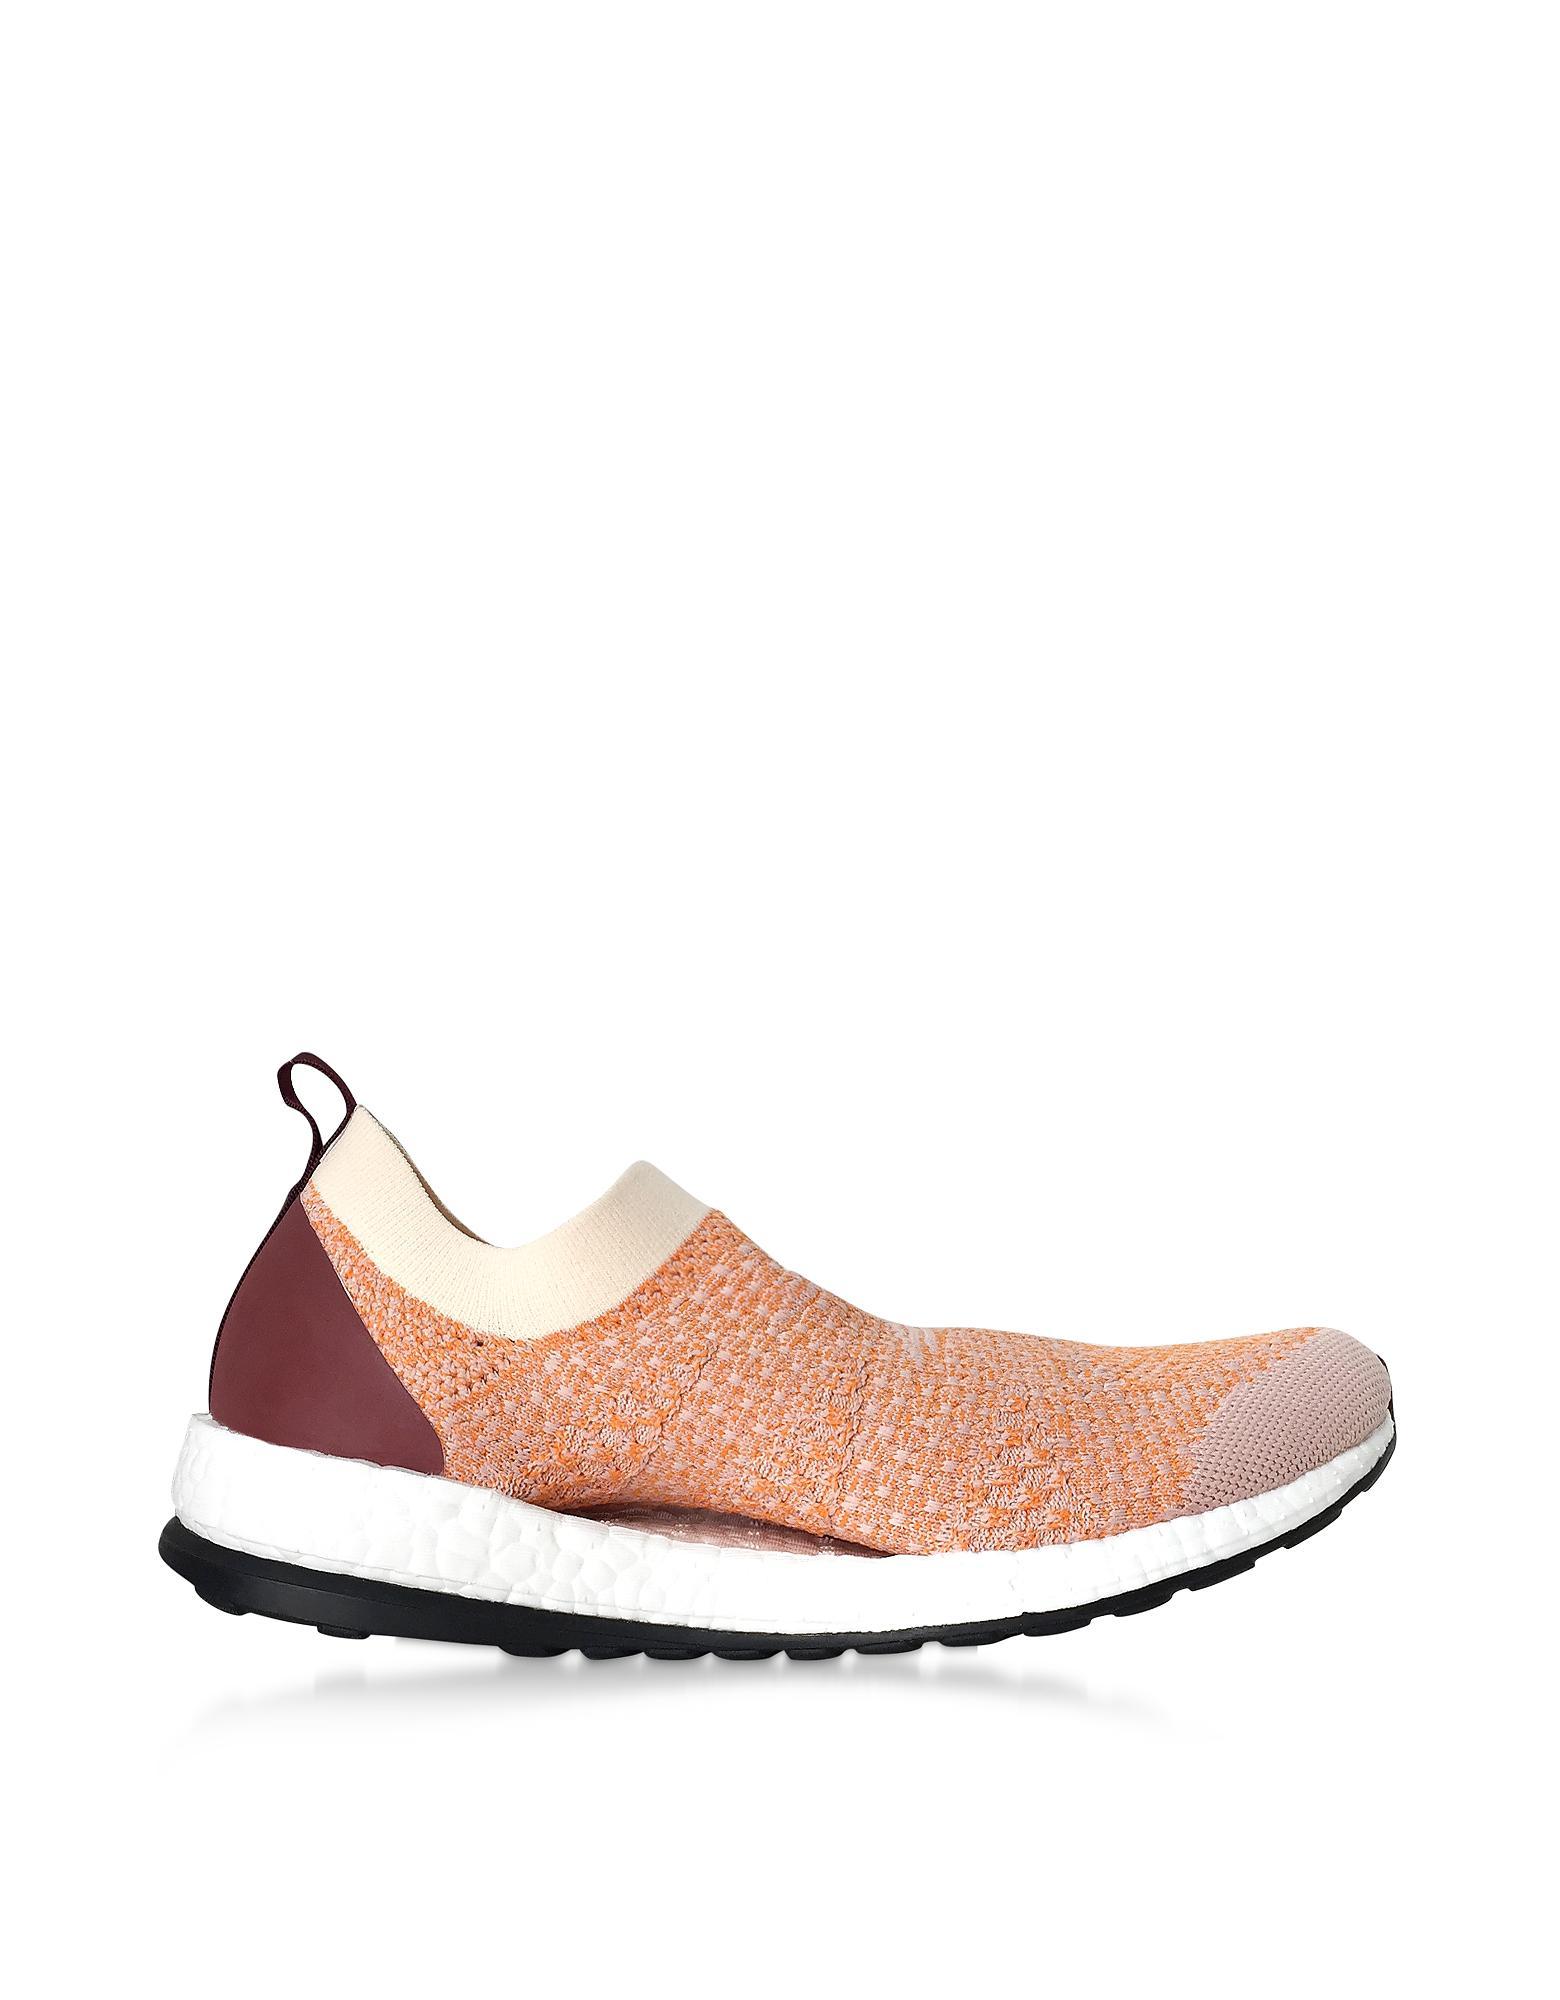 7e7b24e6747df Lyst - adidas By Stella McCartney Pearl Rose Pureboostx Trainers in Pink